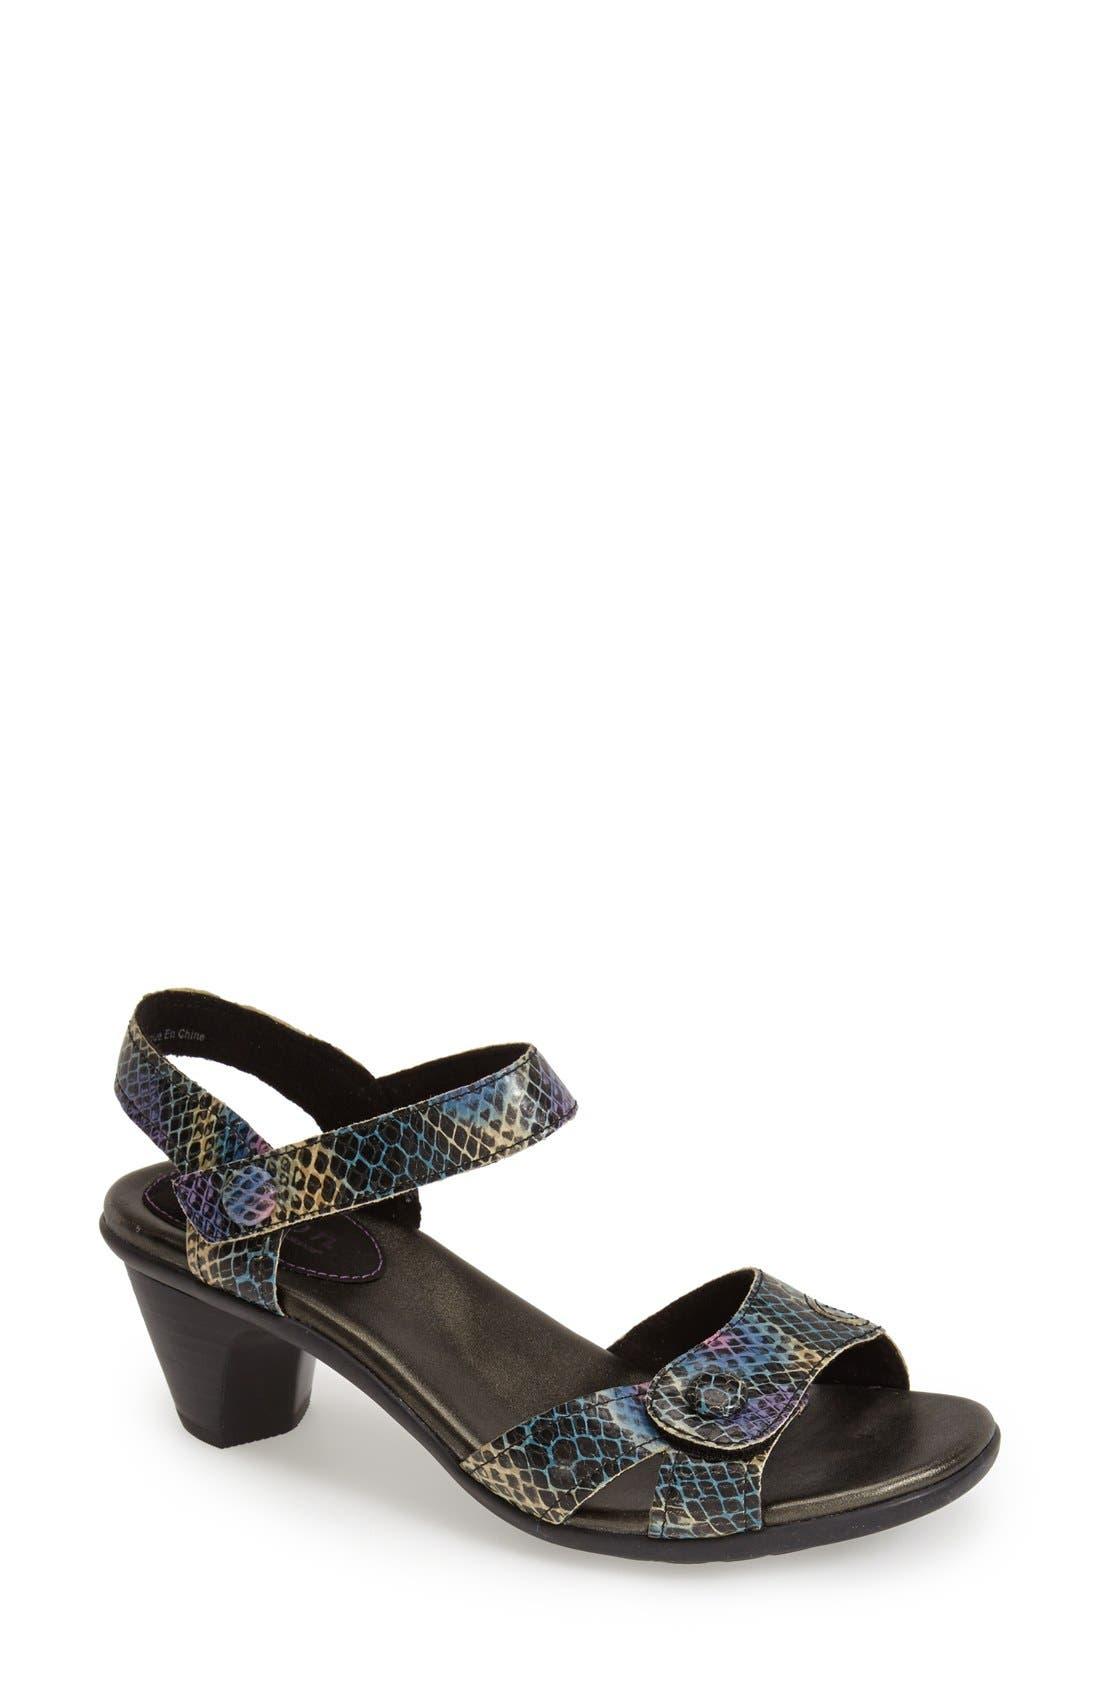 Main Image - Aravon 'Mila' Sandal